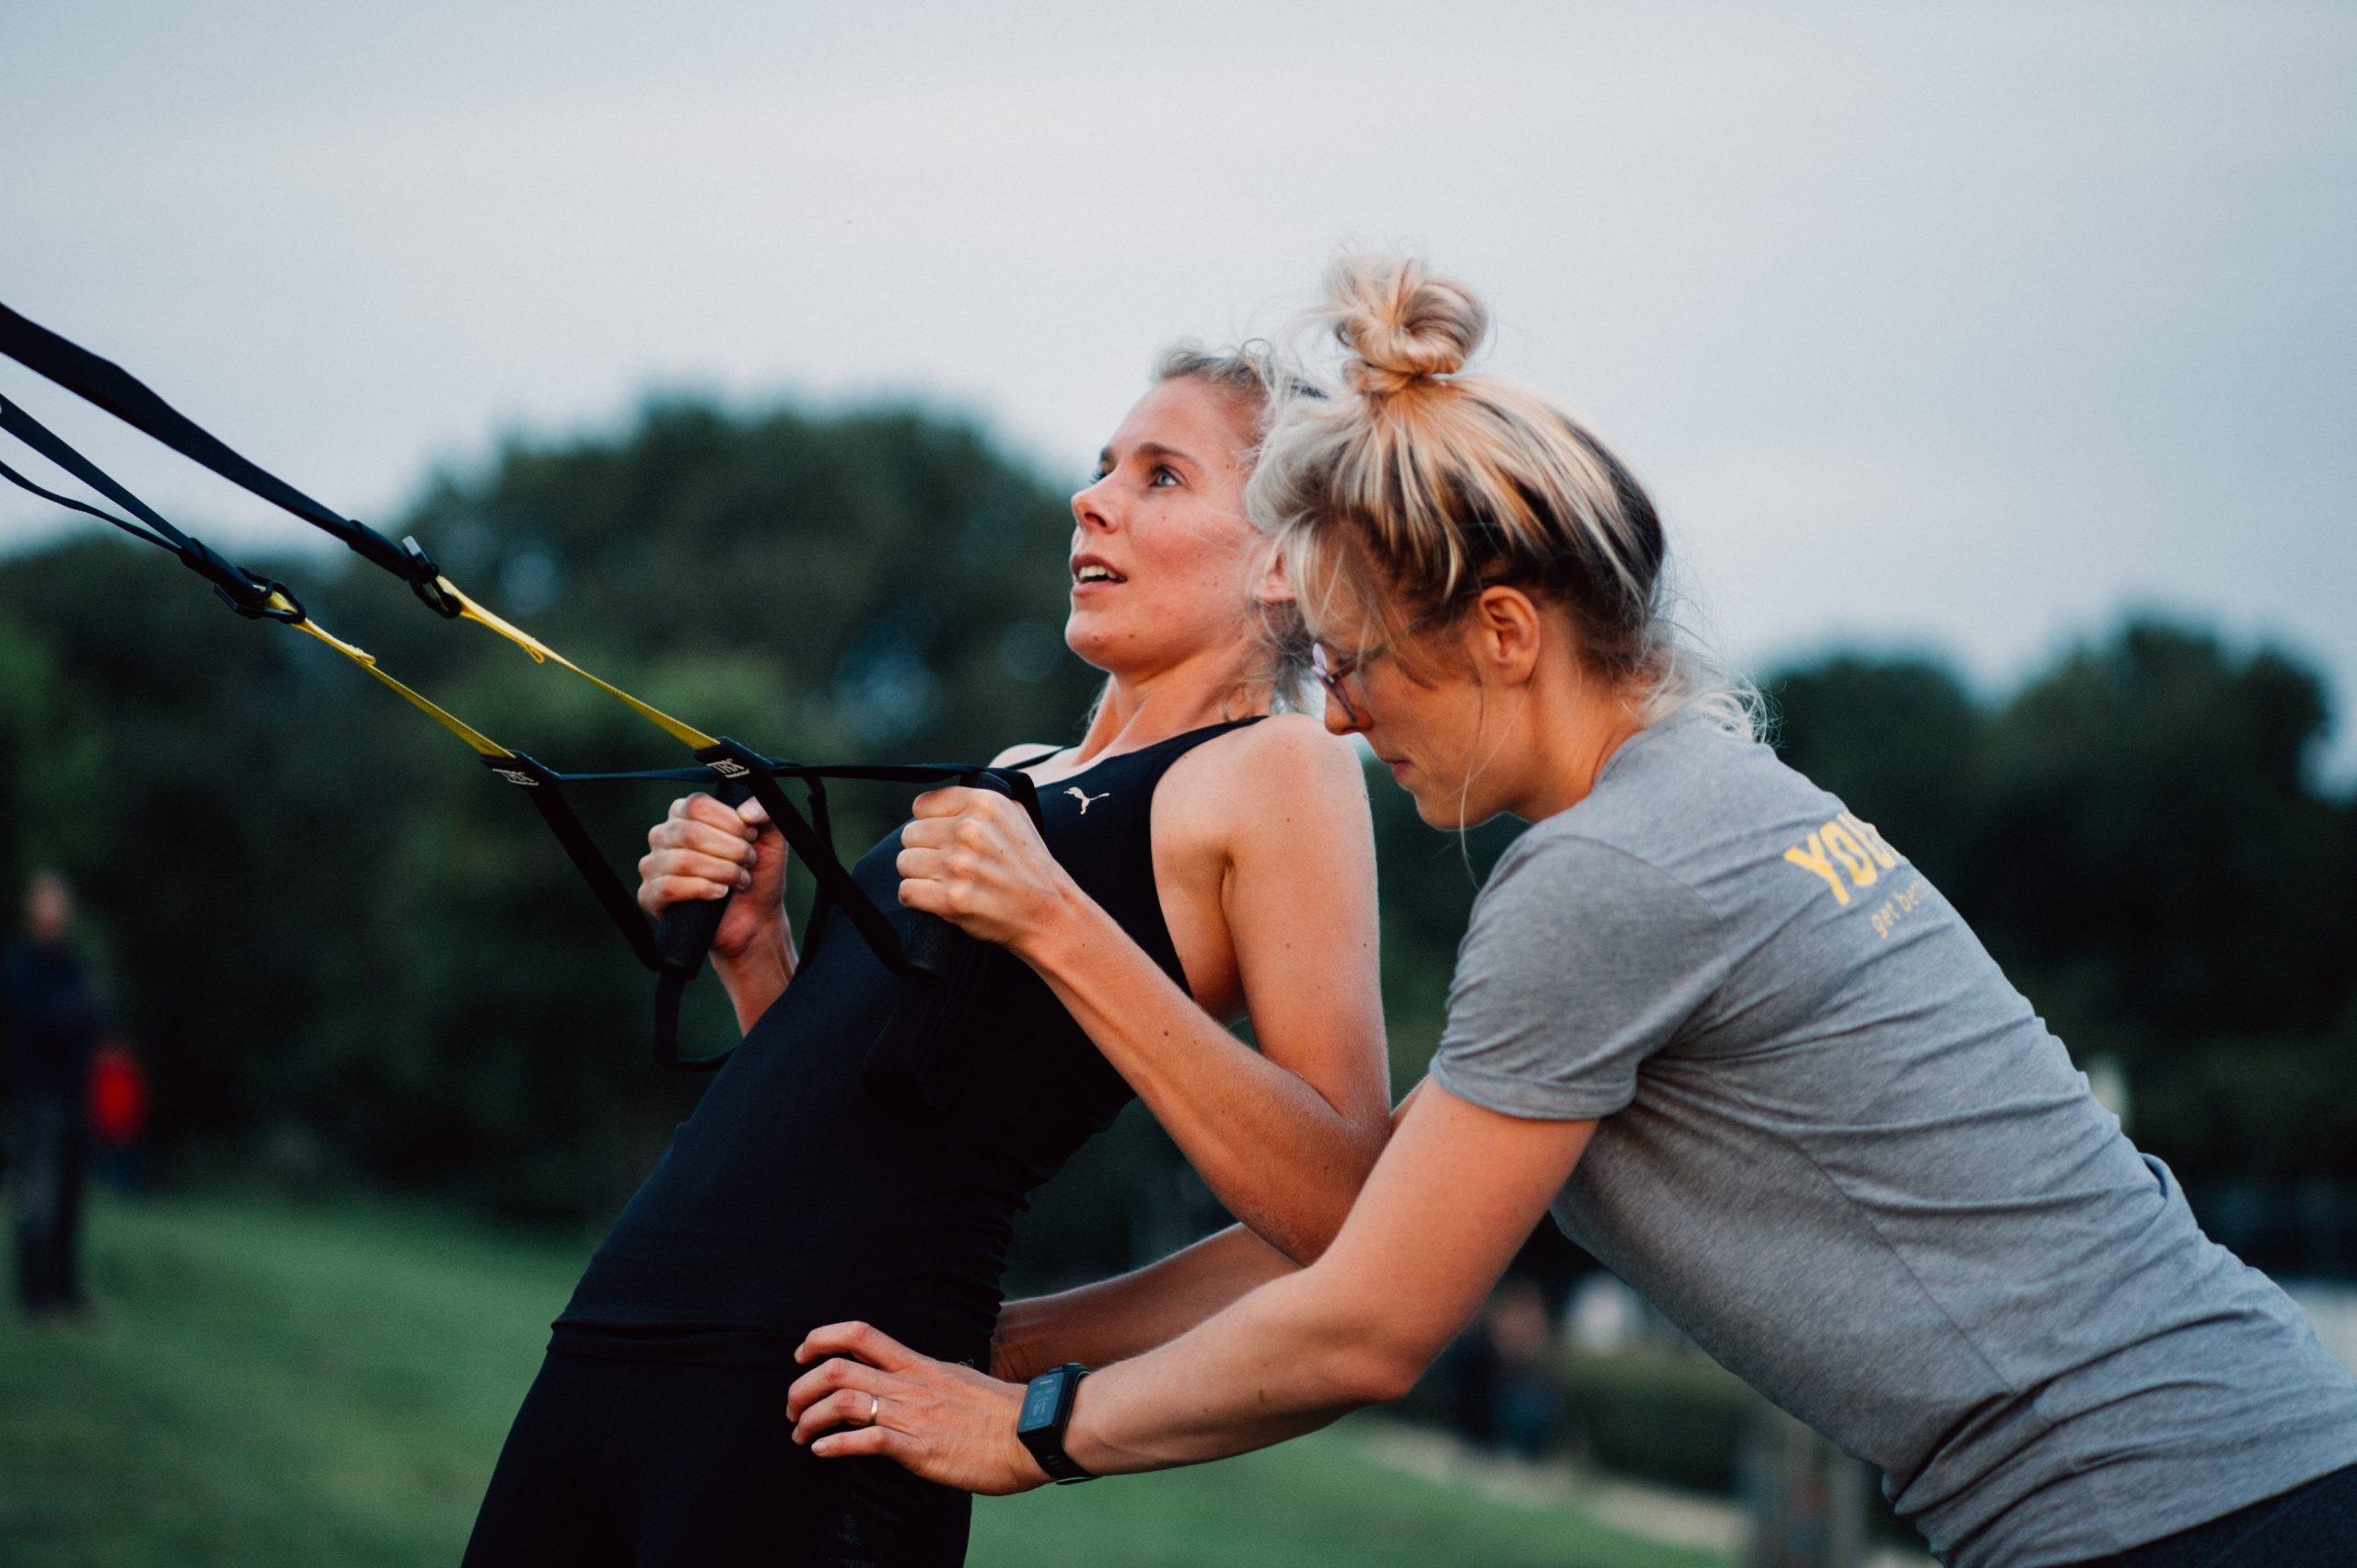 Personal Training in Amsterdam – Hoe je de beste trainer vindt